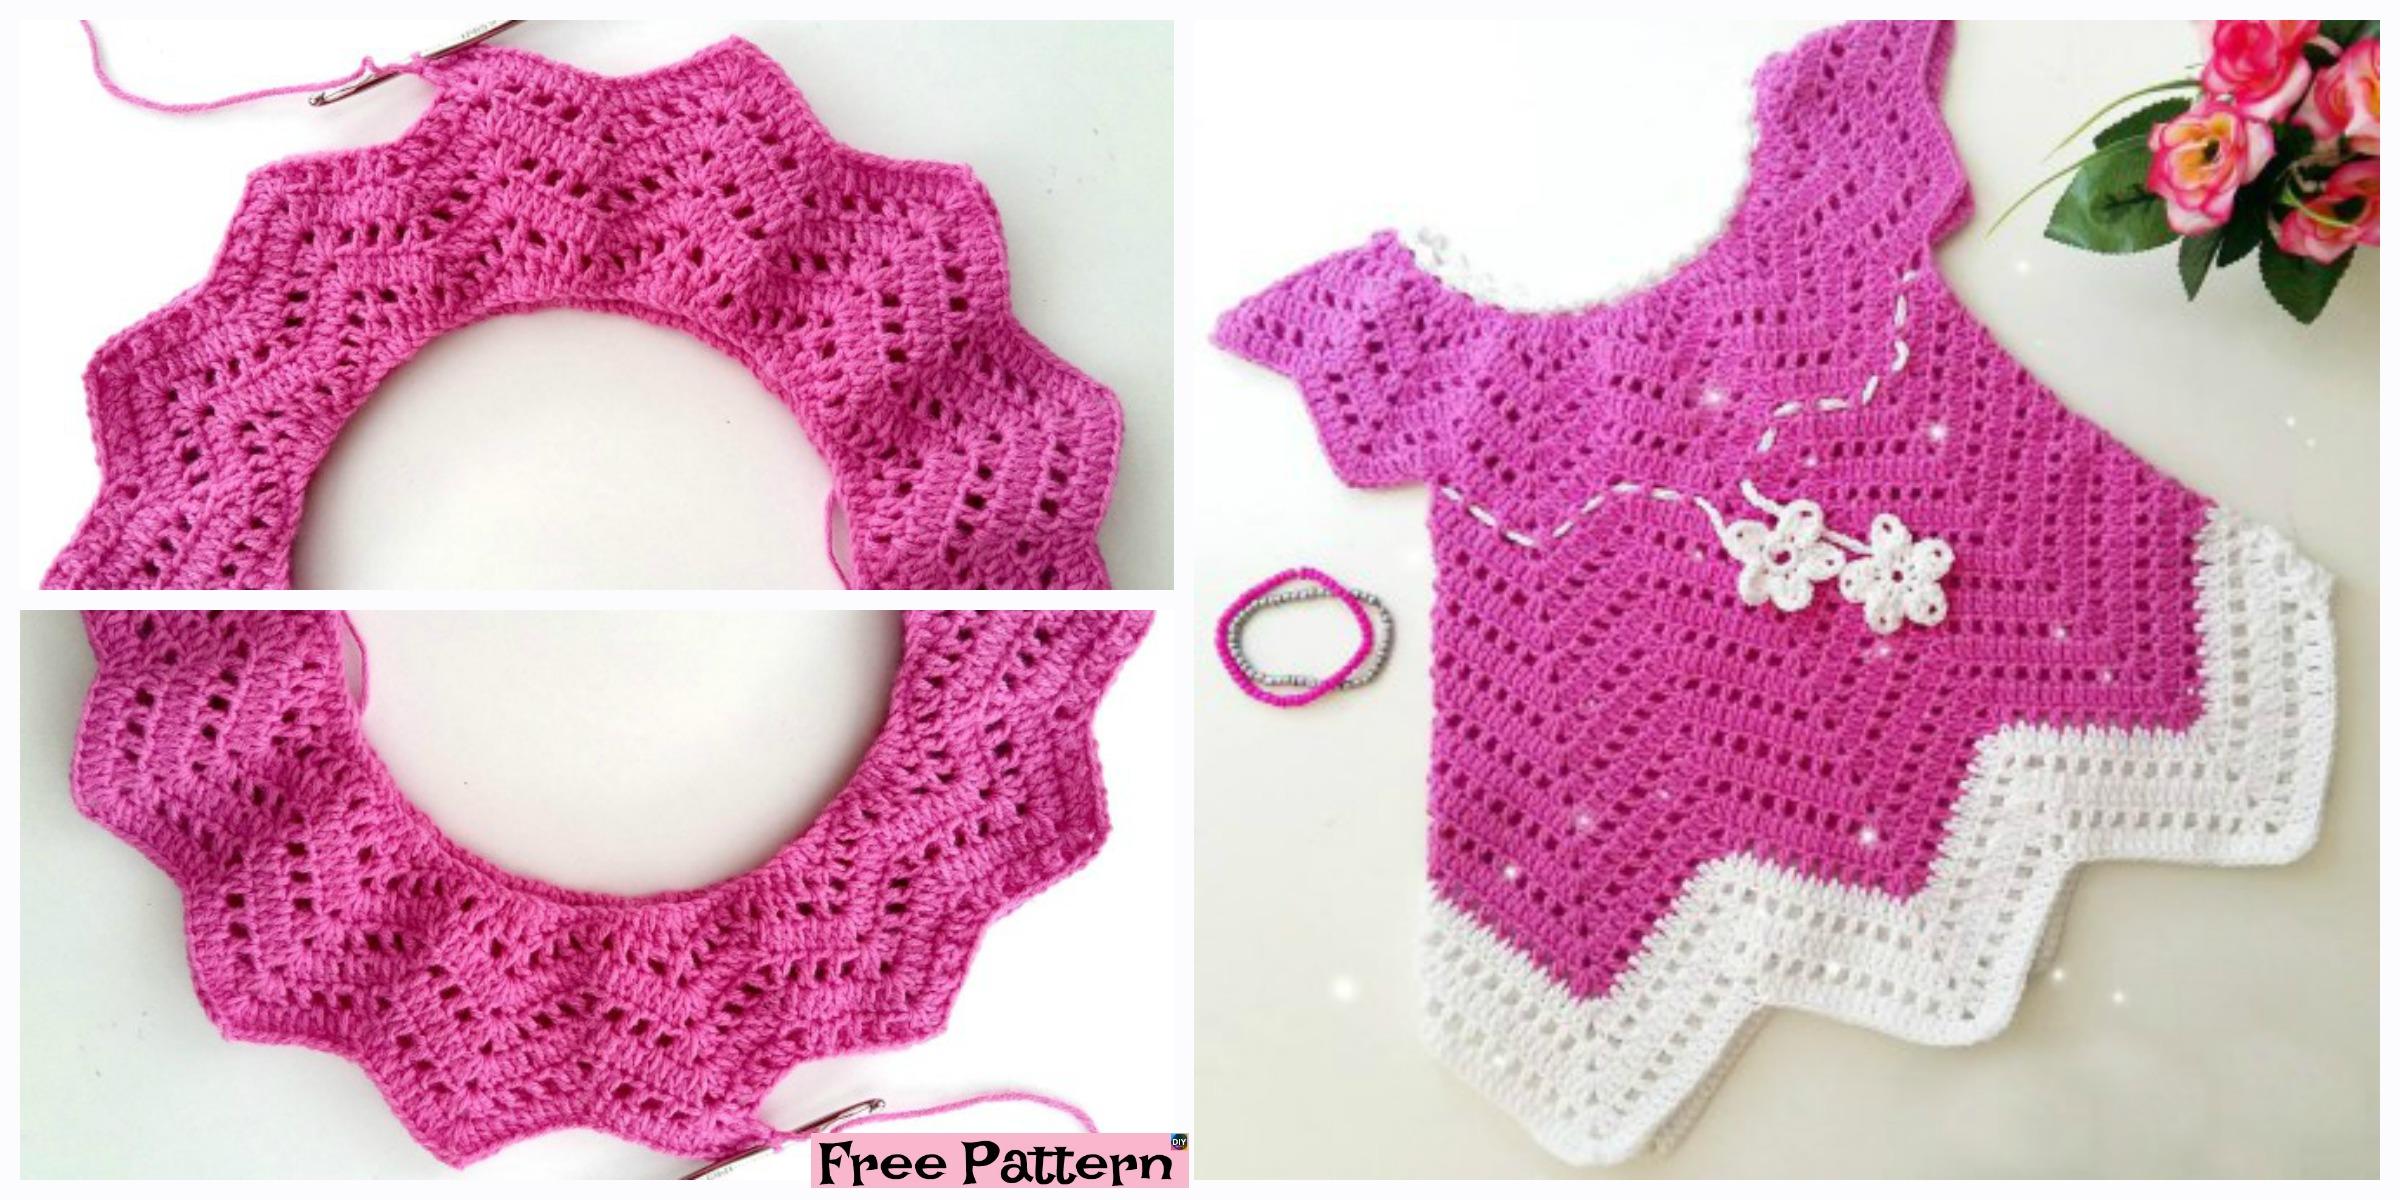 Pretty Crochet Baby Blossom Dress – Free Pattern